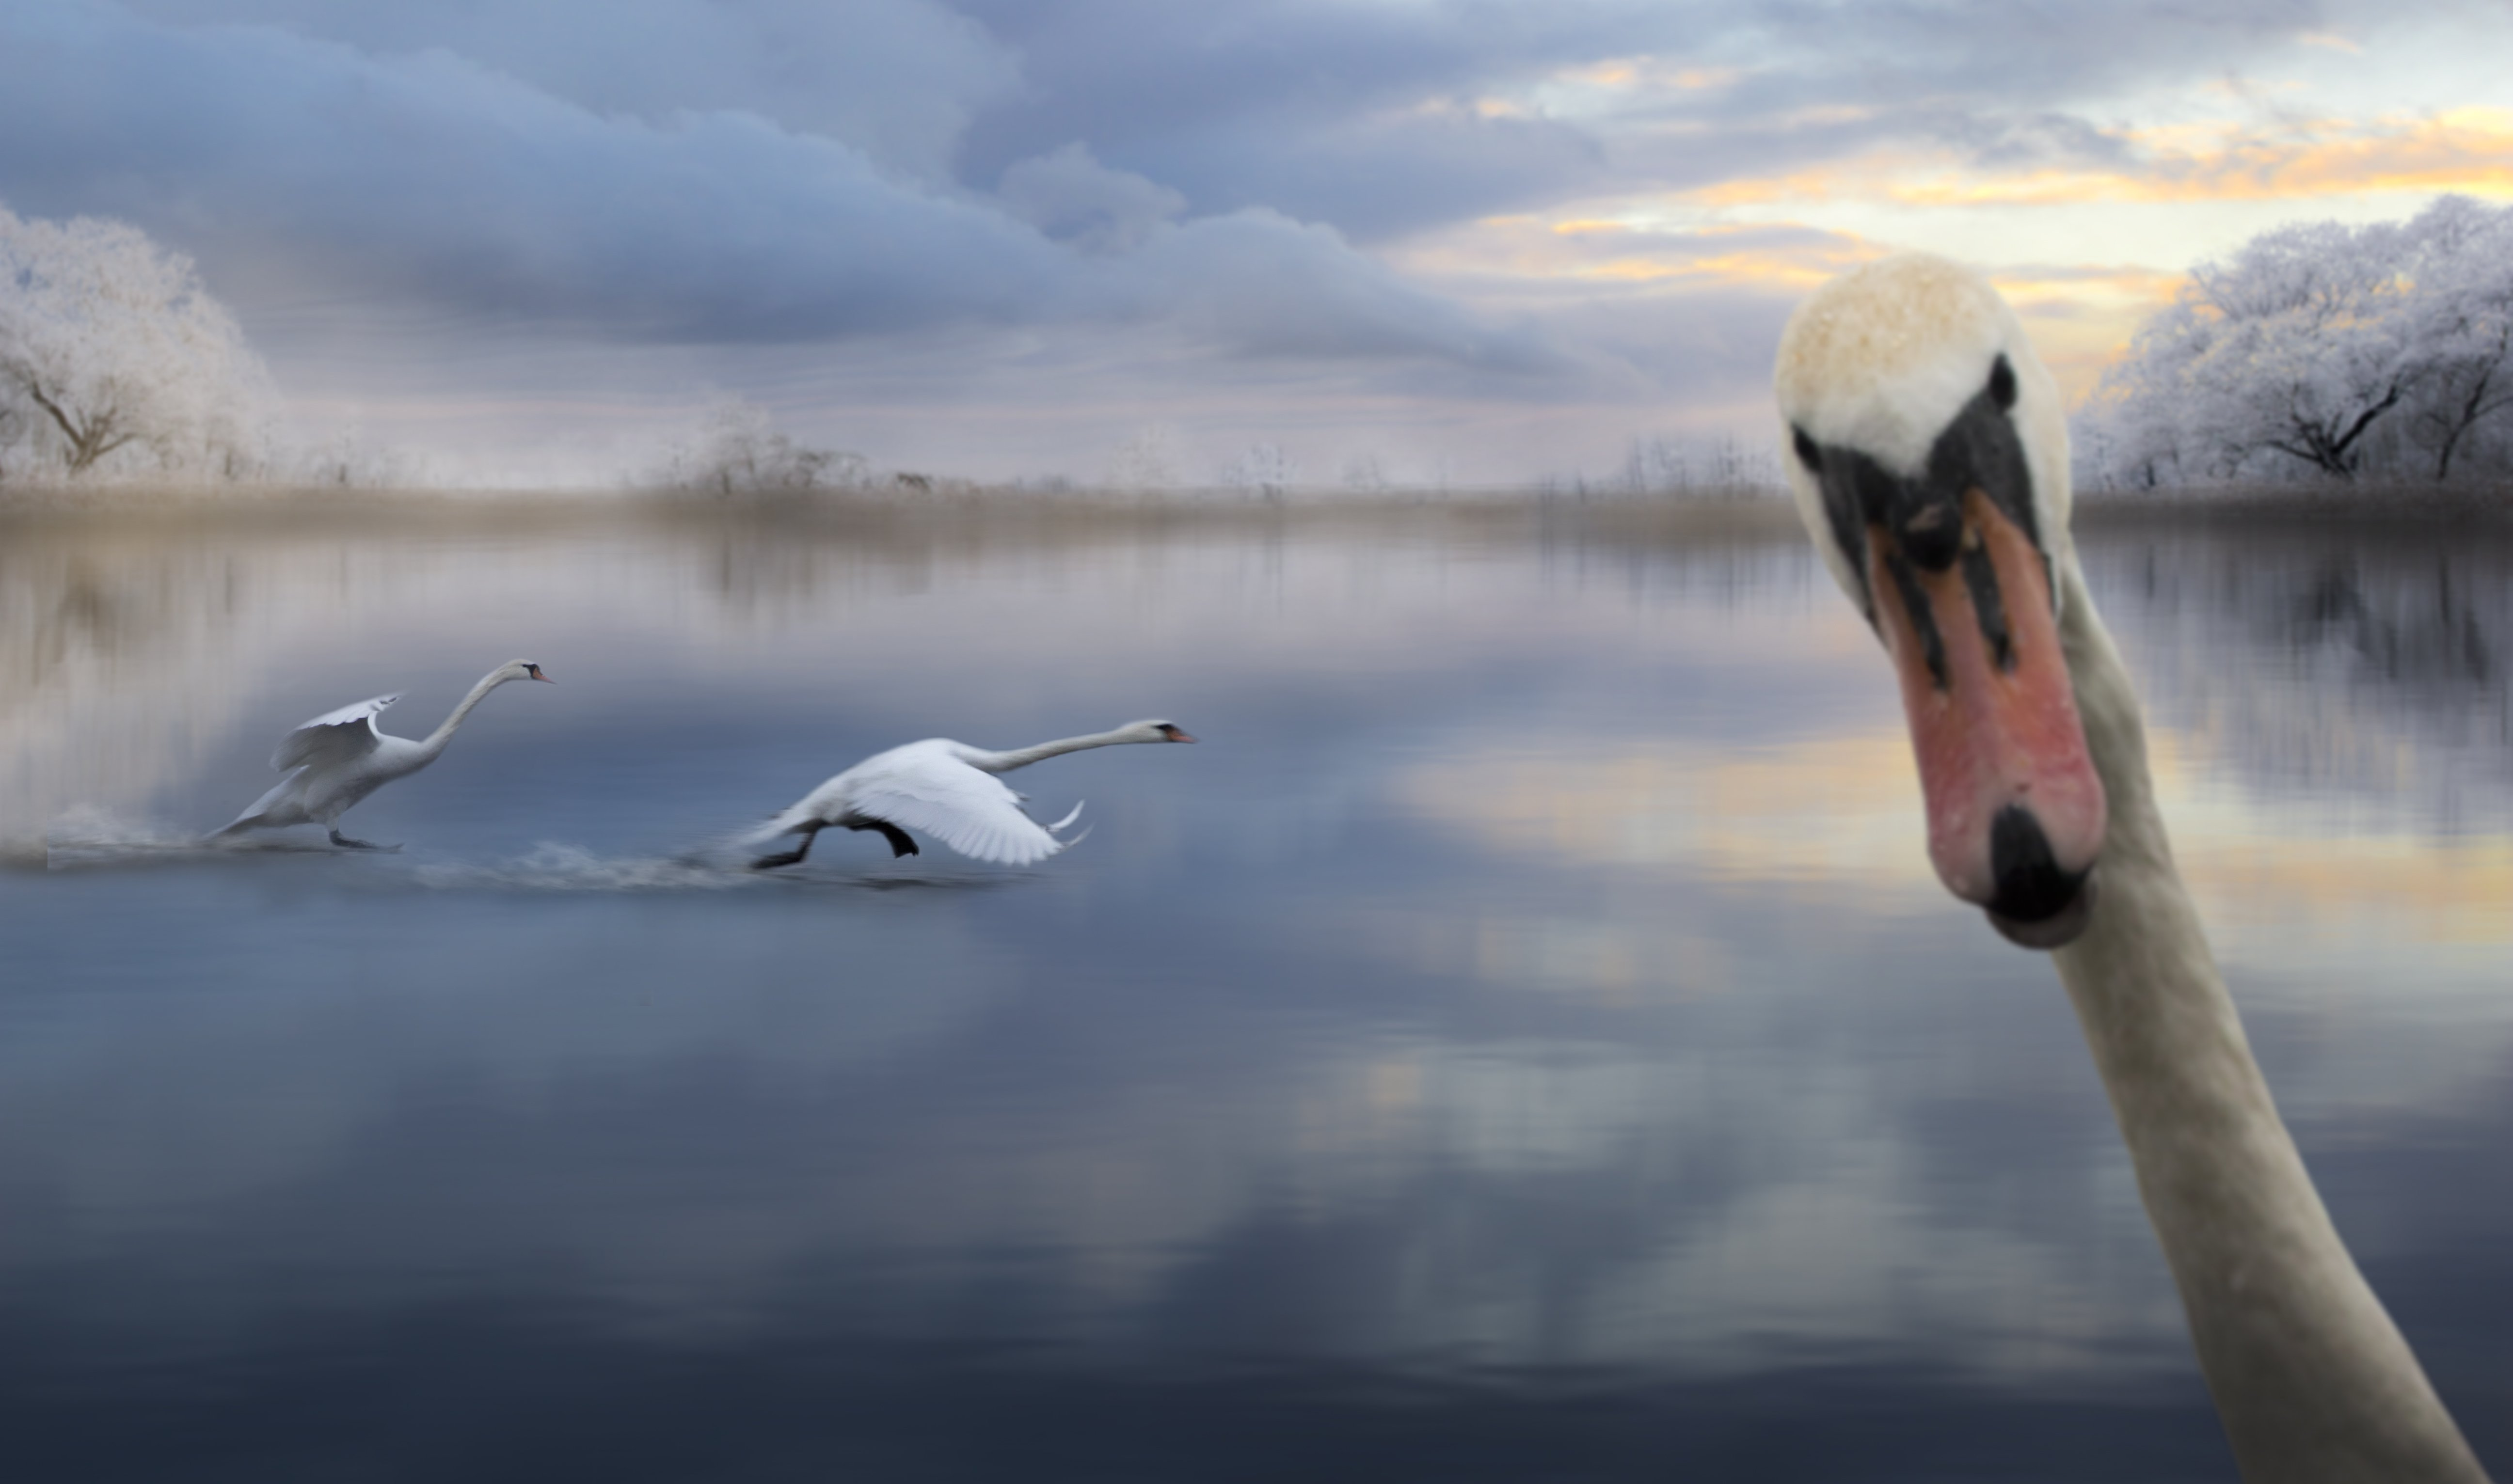 лебеди, озеро, зима, птицы, полет, река, пейзаж,, Фото Брест